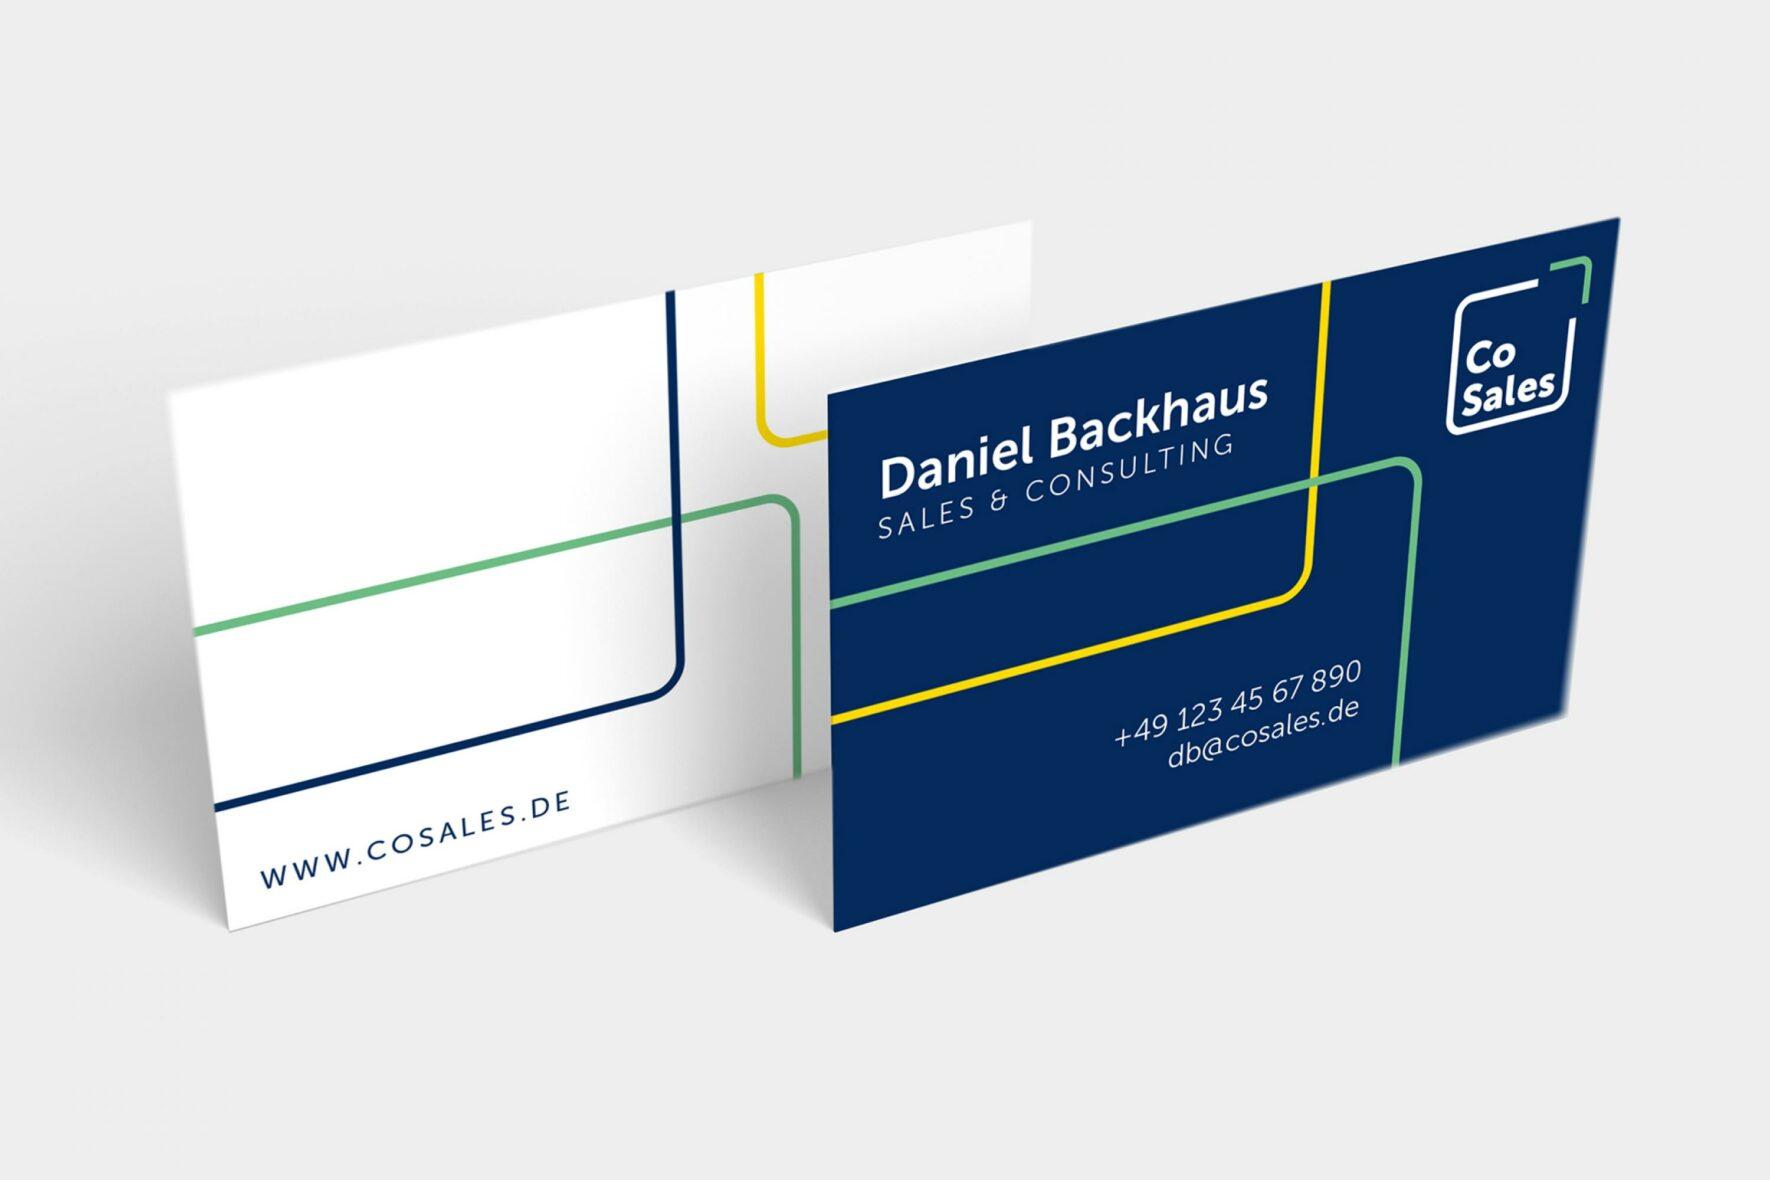 CoSales-Visitenkarten-Gestaltung-Corporate-Design-Print-FORMLOS-Berlin-2